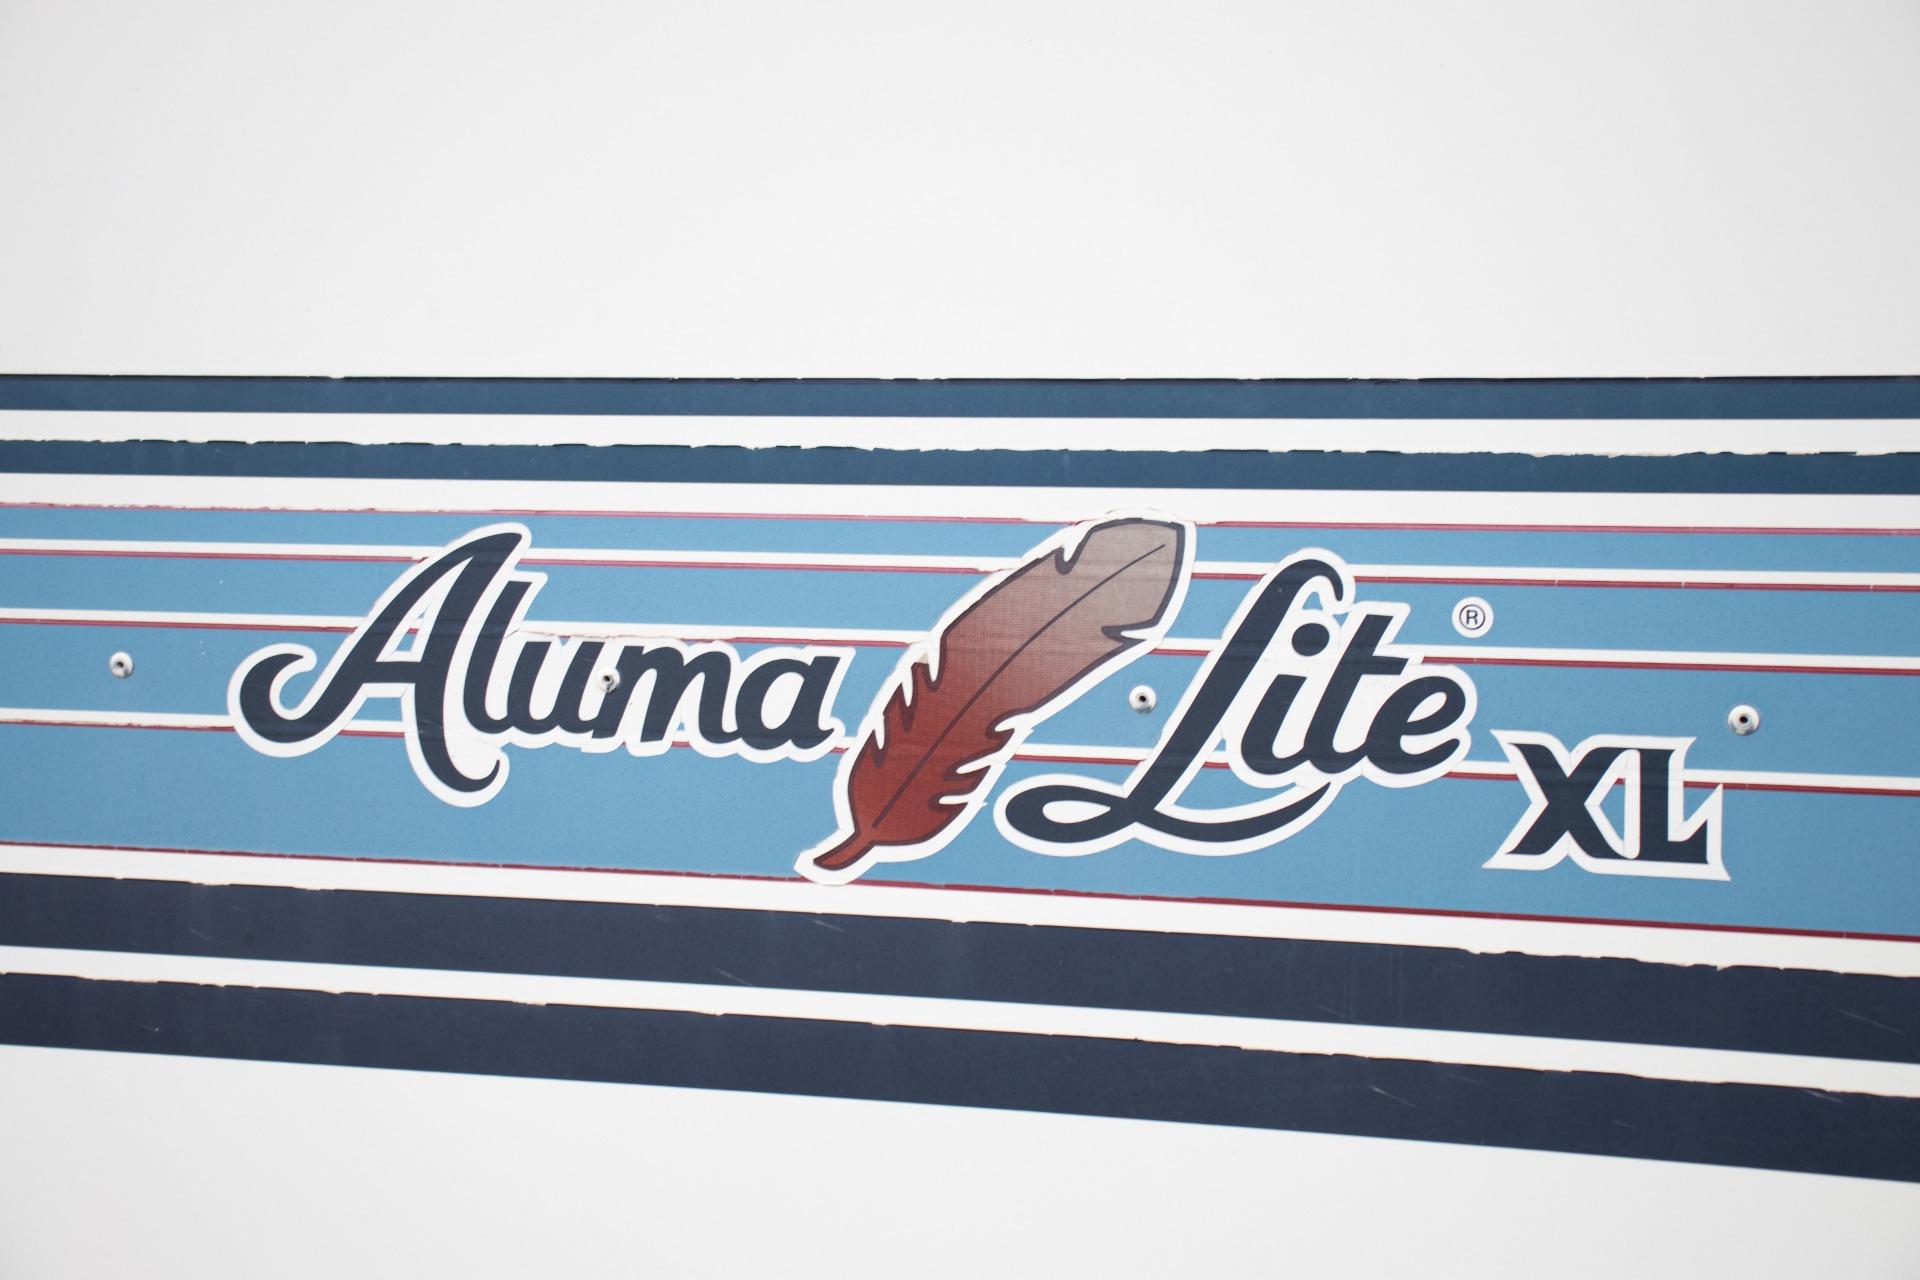 Used-1990-Rambler-Aluma-Lite